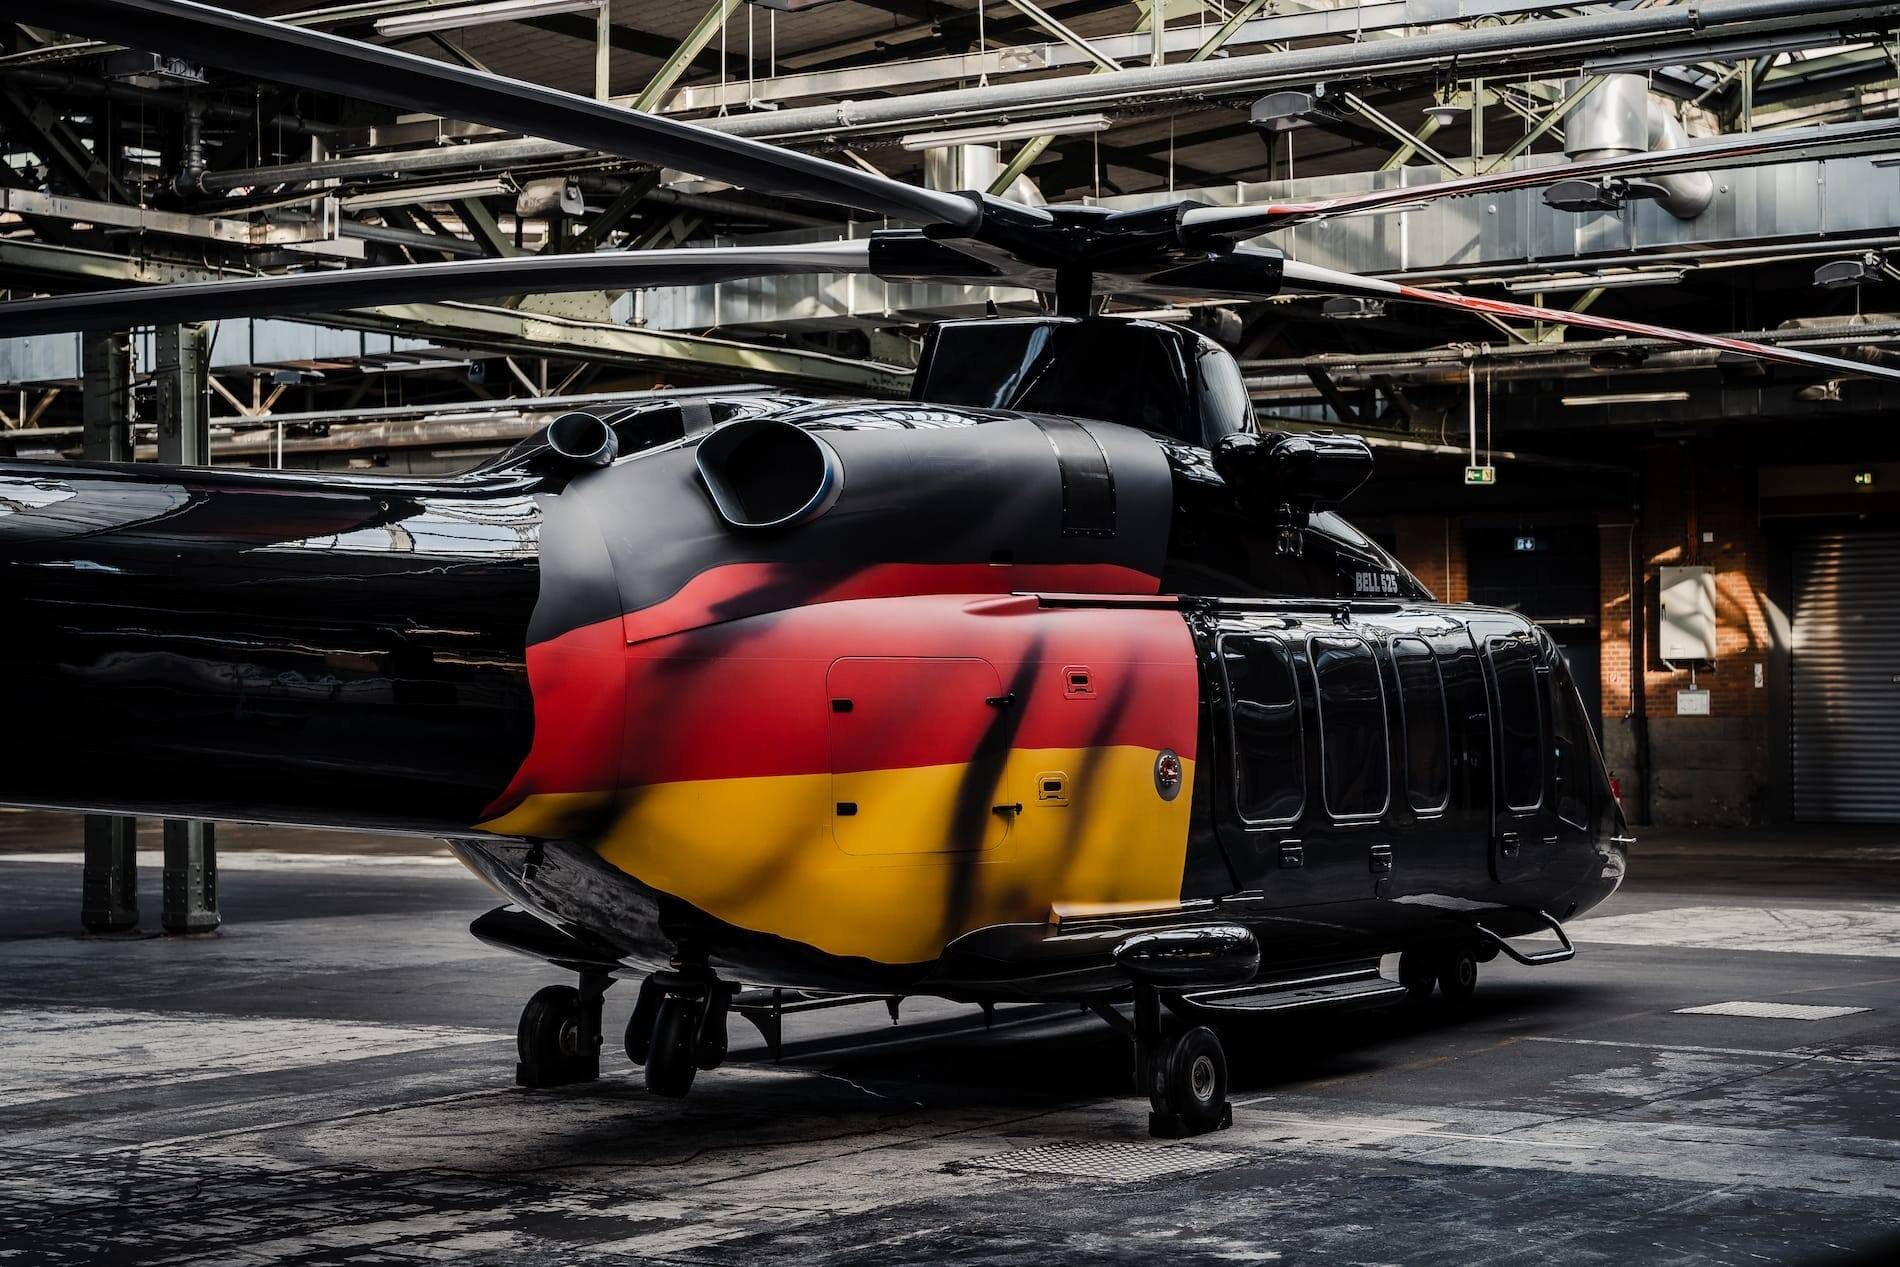 BELL_525_Germany-11